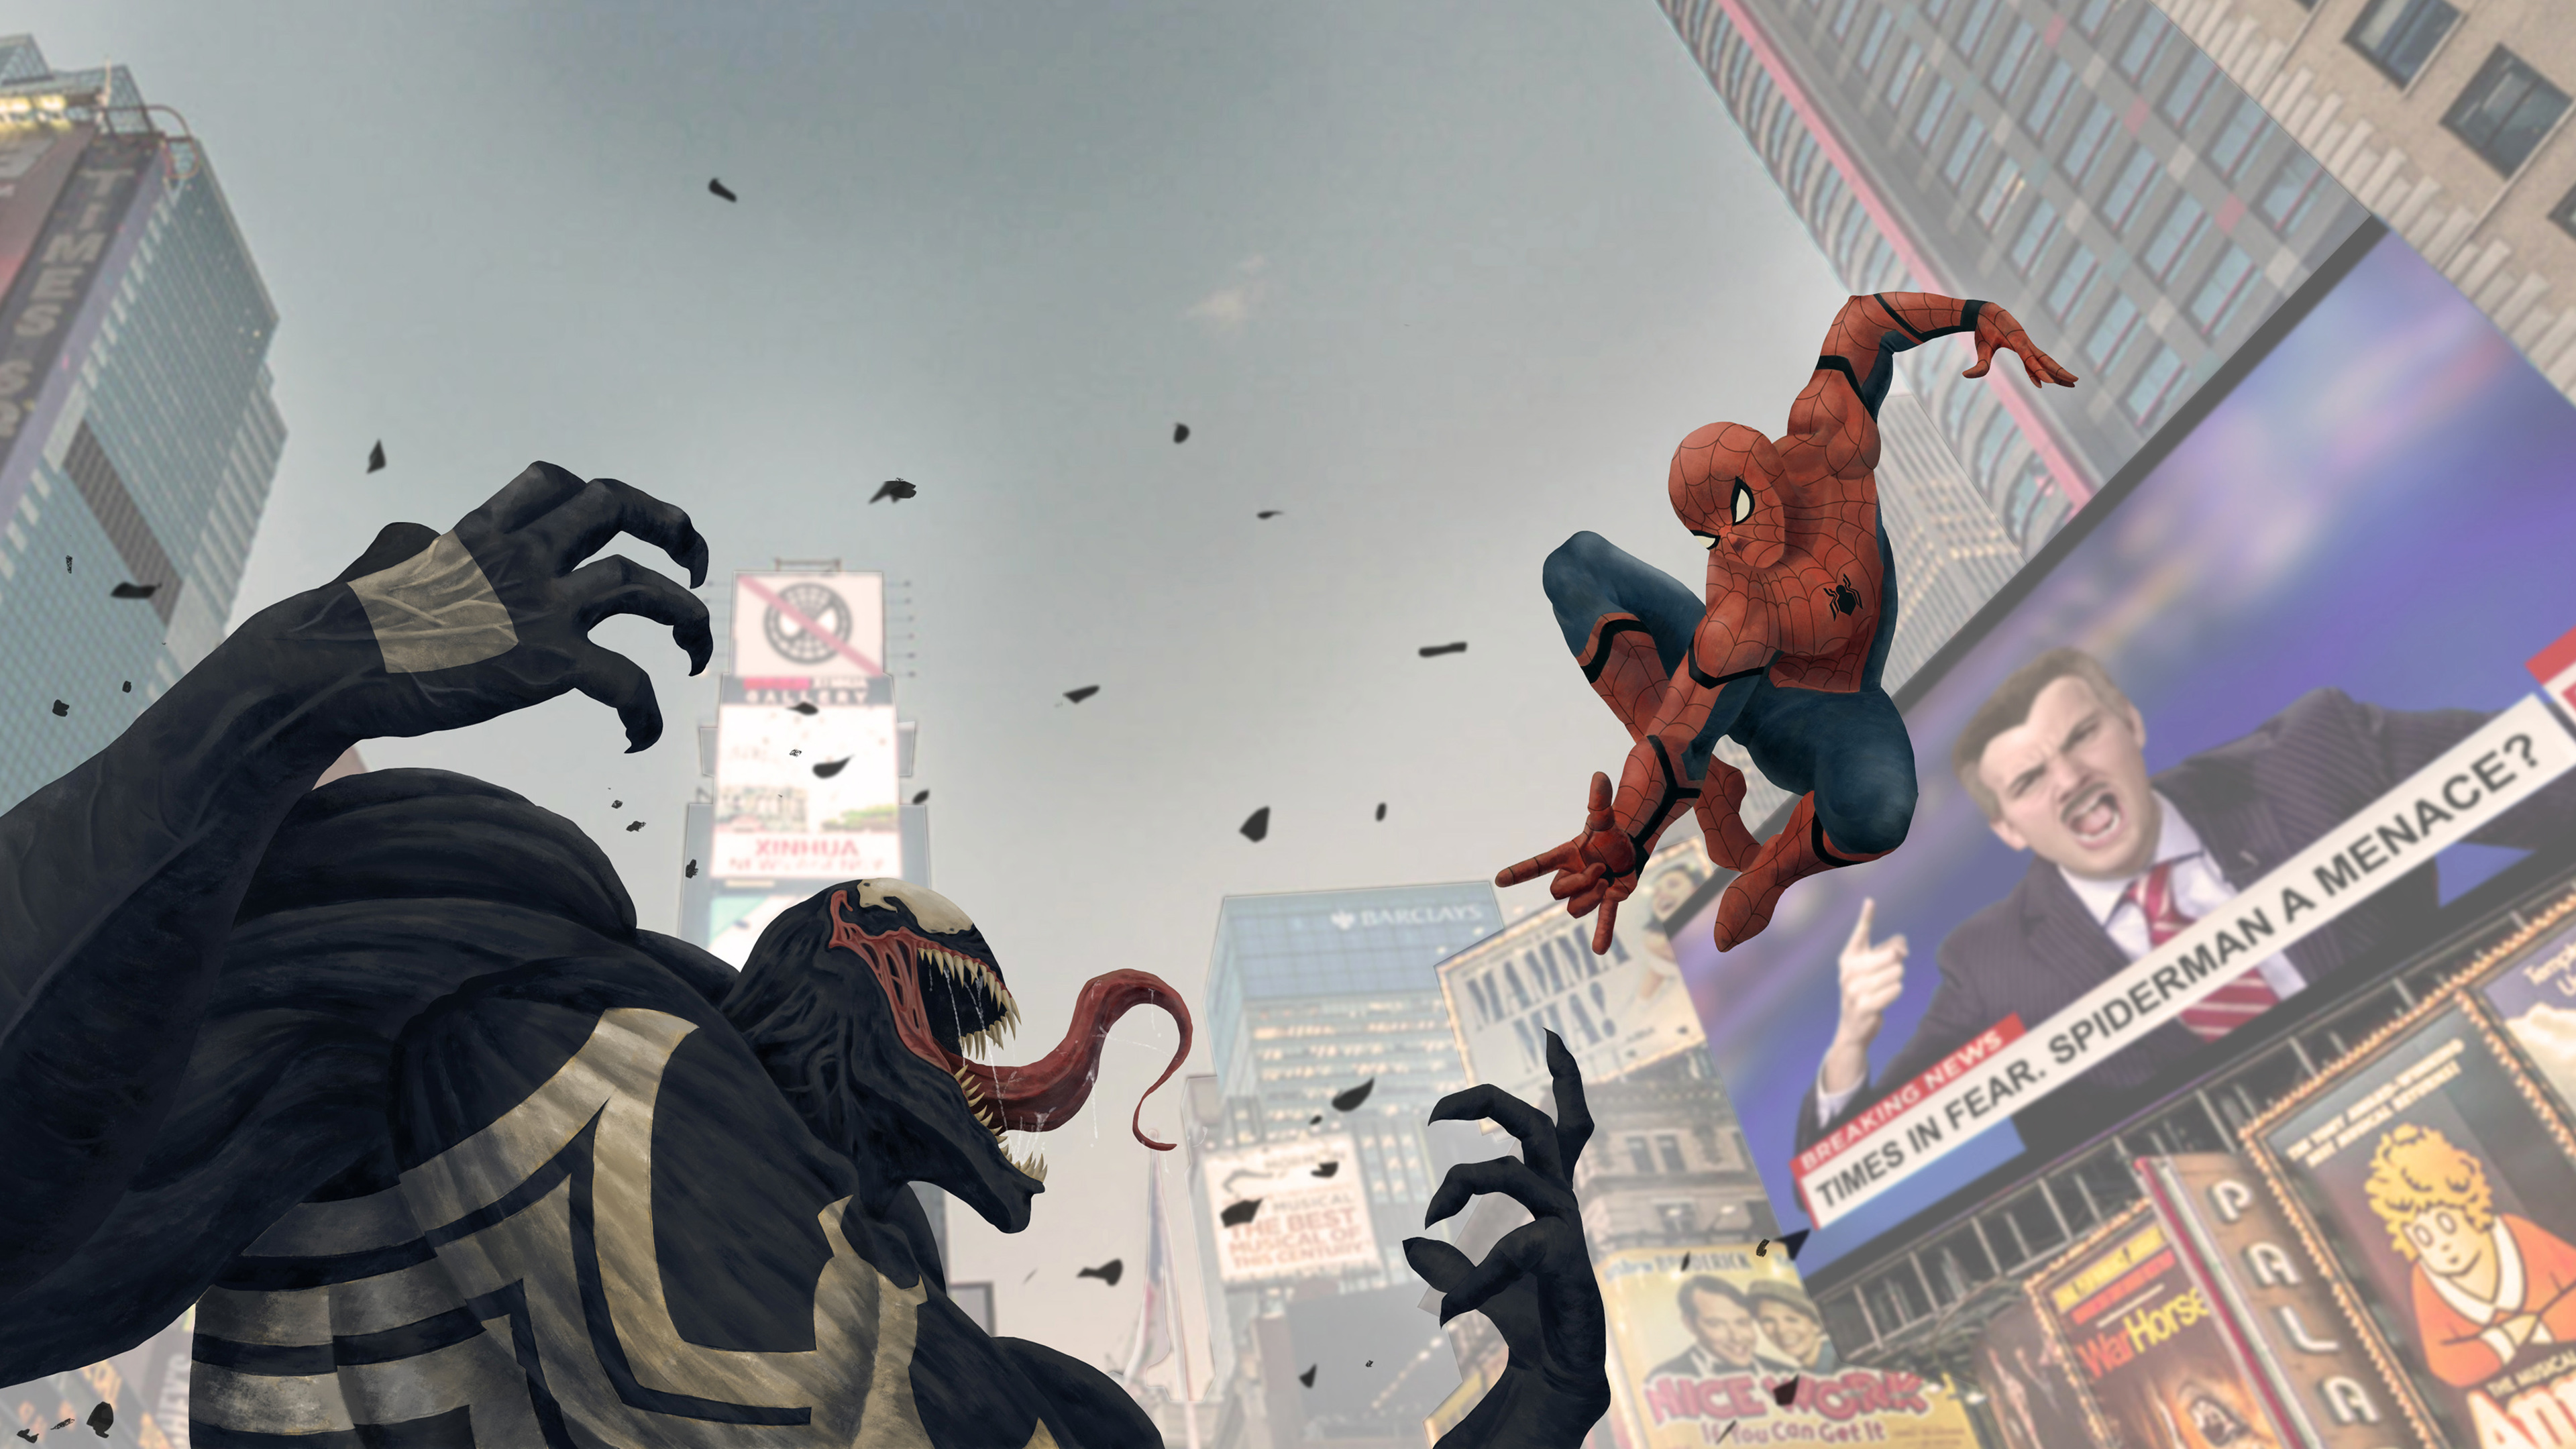 spiderman vs venom menace 1569186254 - Spiderman Vs Venom Menace - Venom wallpapers, superheroes wallpapers, spiderman wallpapers, hd-wallpapers, behance wallpapers, artwork wallpapers, artist wallpapers, 4k-wallpapers